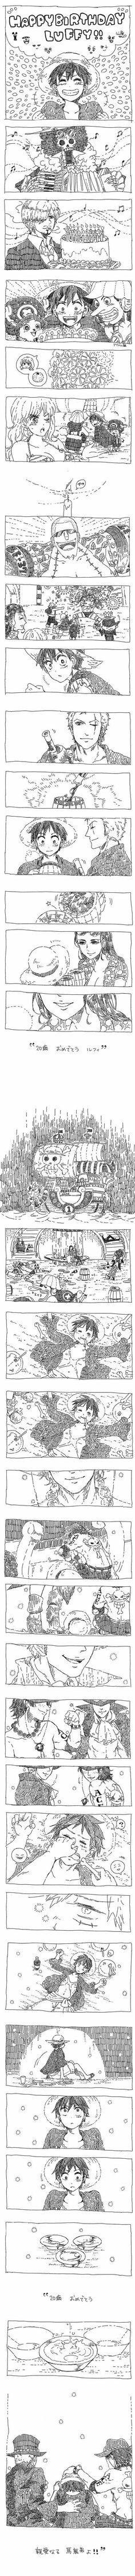 Luffy ace sabo brook zoro sanji usopp chooper mugiwara robin nami Frank happy b irthday sunny gon Brothers One Piece Anime, Sanji One Piece, One Piece Comic, Haikyuu, The Pirates, Manga Anime, Tsurezure Children, Ace Sabo Luffy, One Piece Images